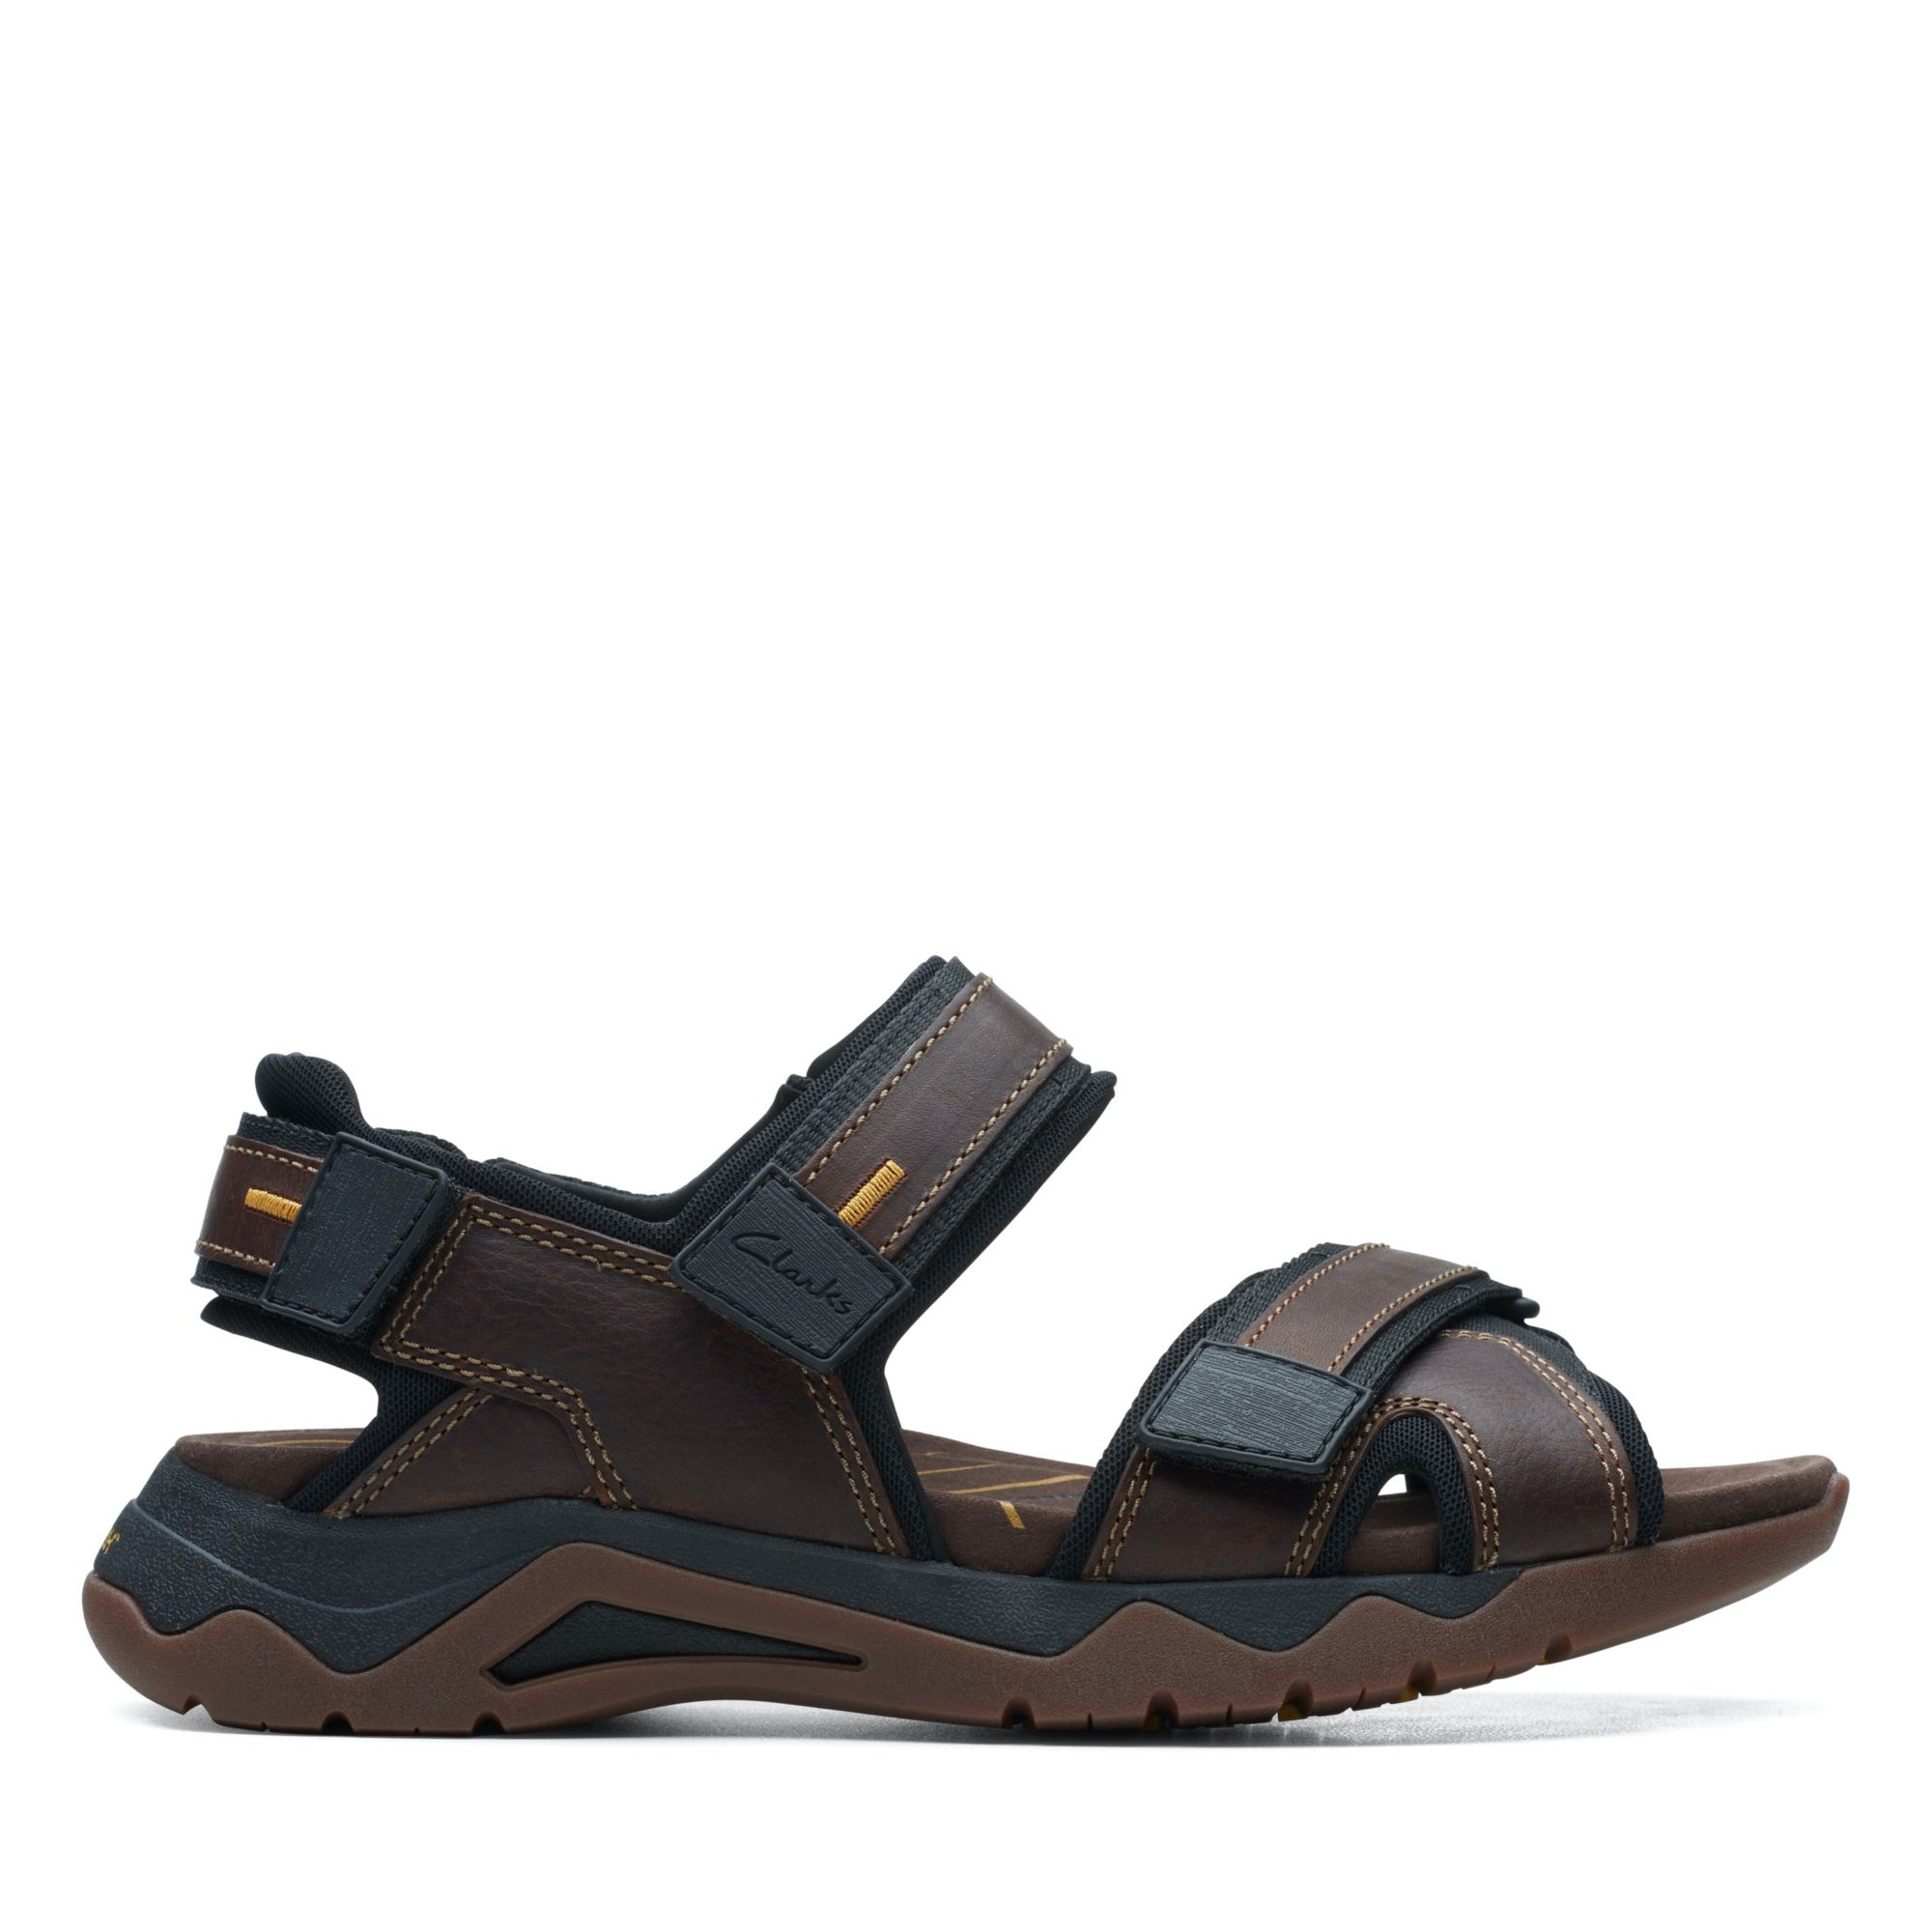 Clarks Wave2.0 Jaunt – Leather